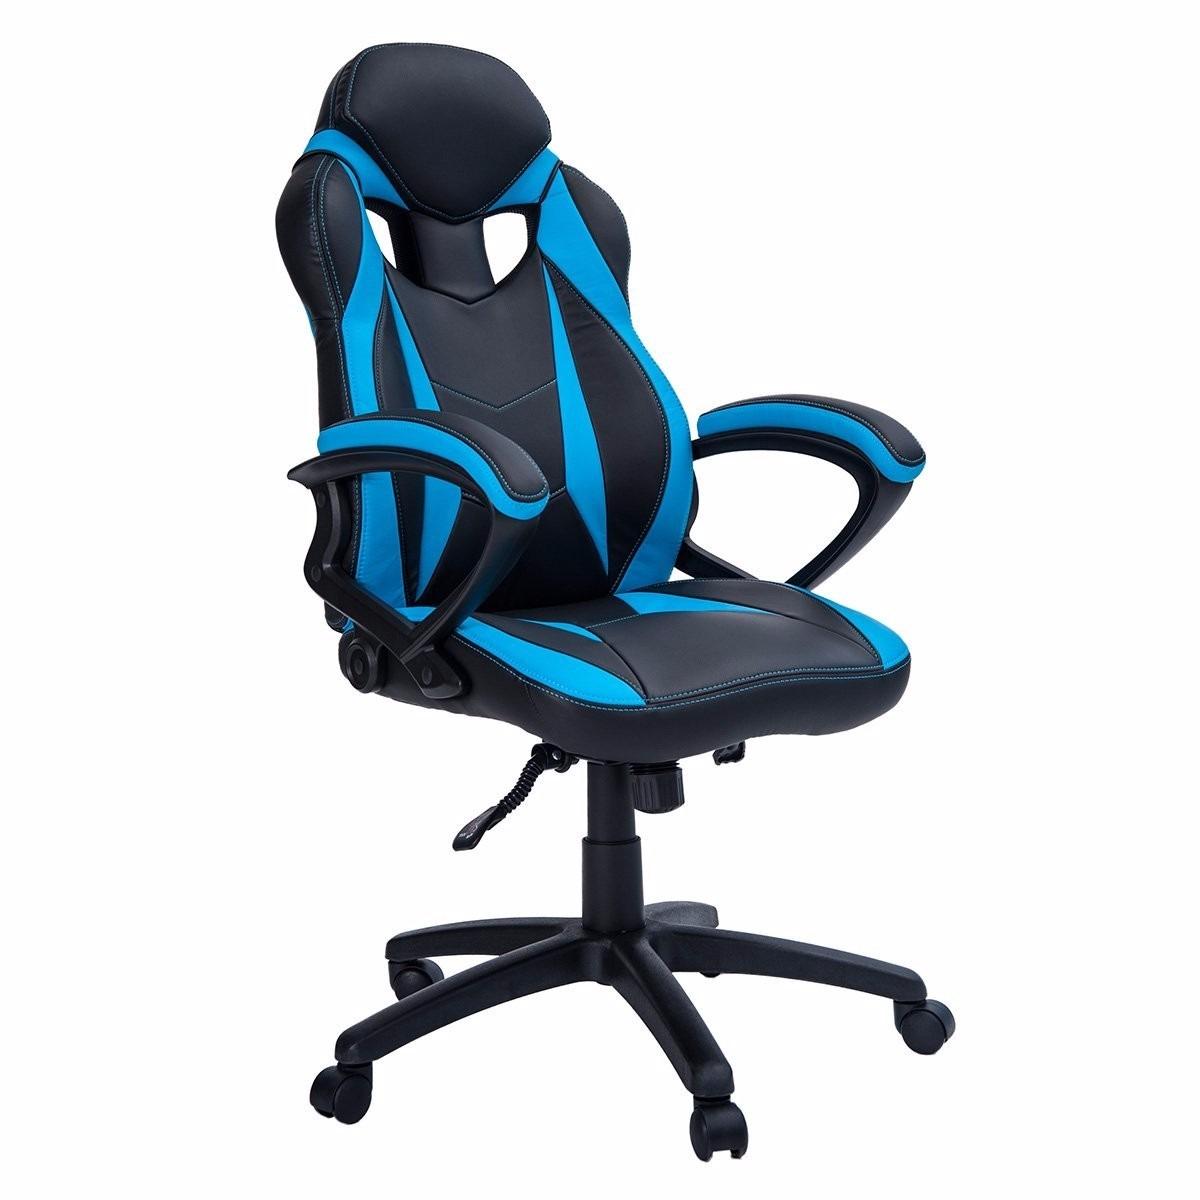 Silla de oficina ergonomica merax azul 4 en for Silla ergonomica amazon